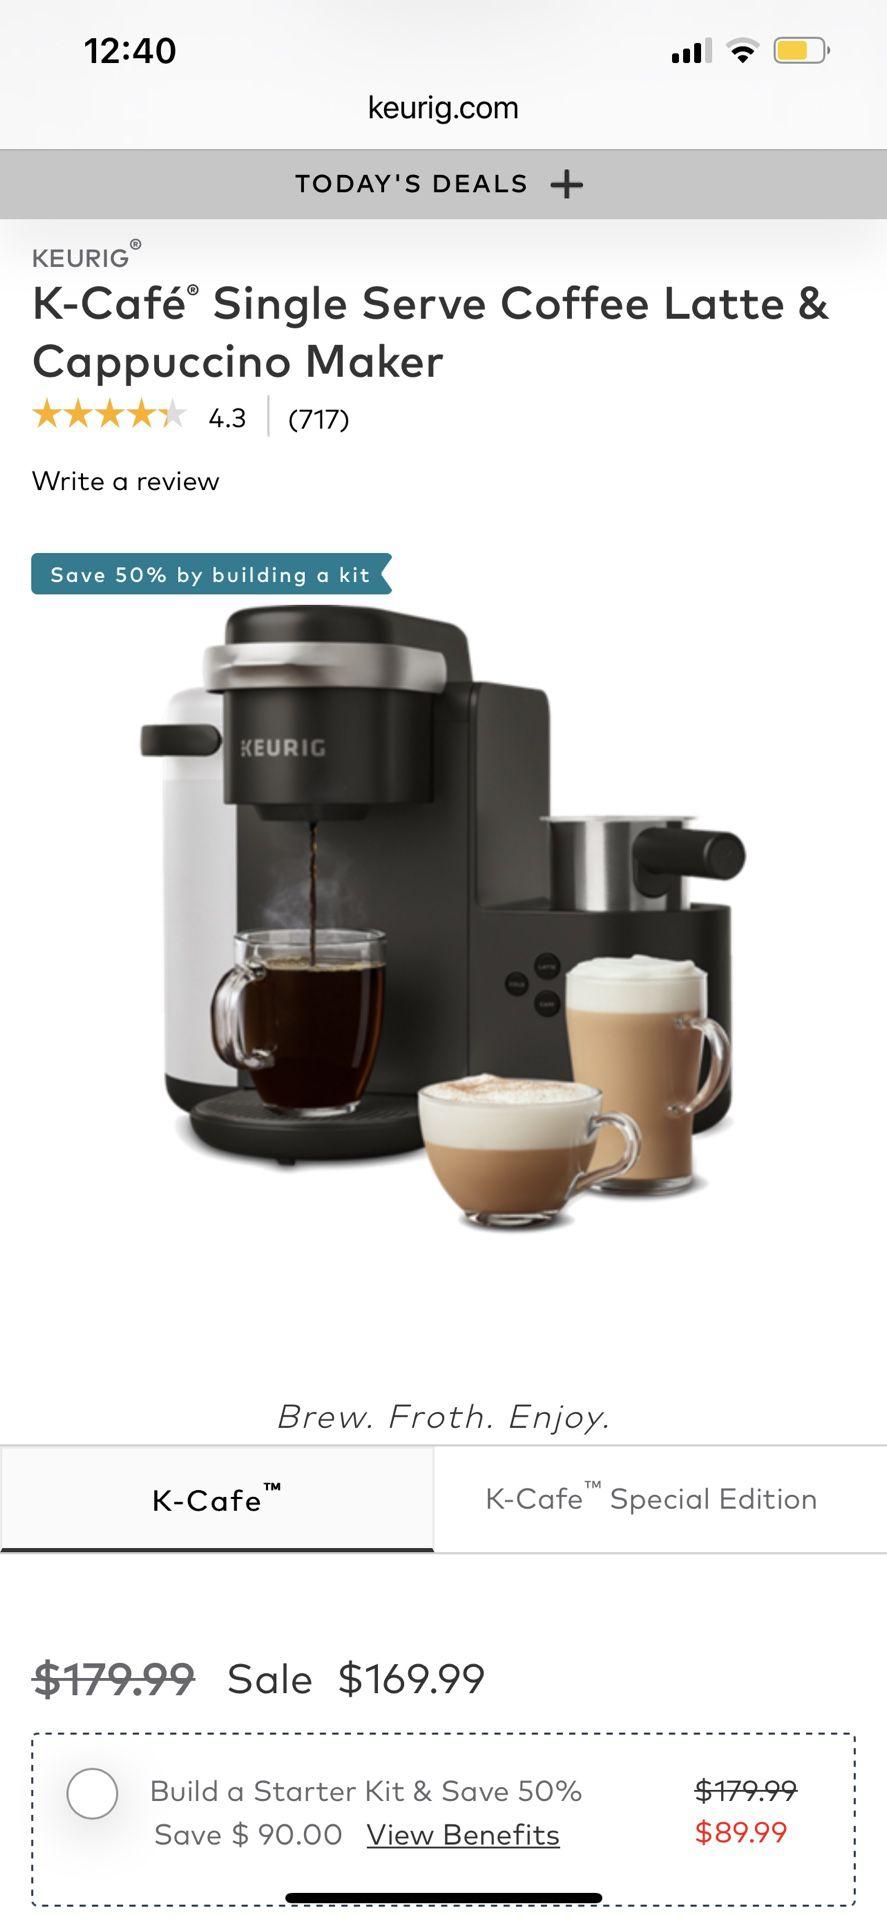 KEURIG K-Cafe  Coffee, Cappuccino & Latte Maker